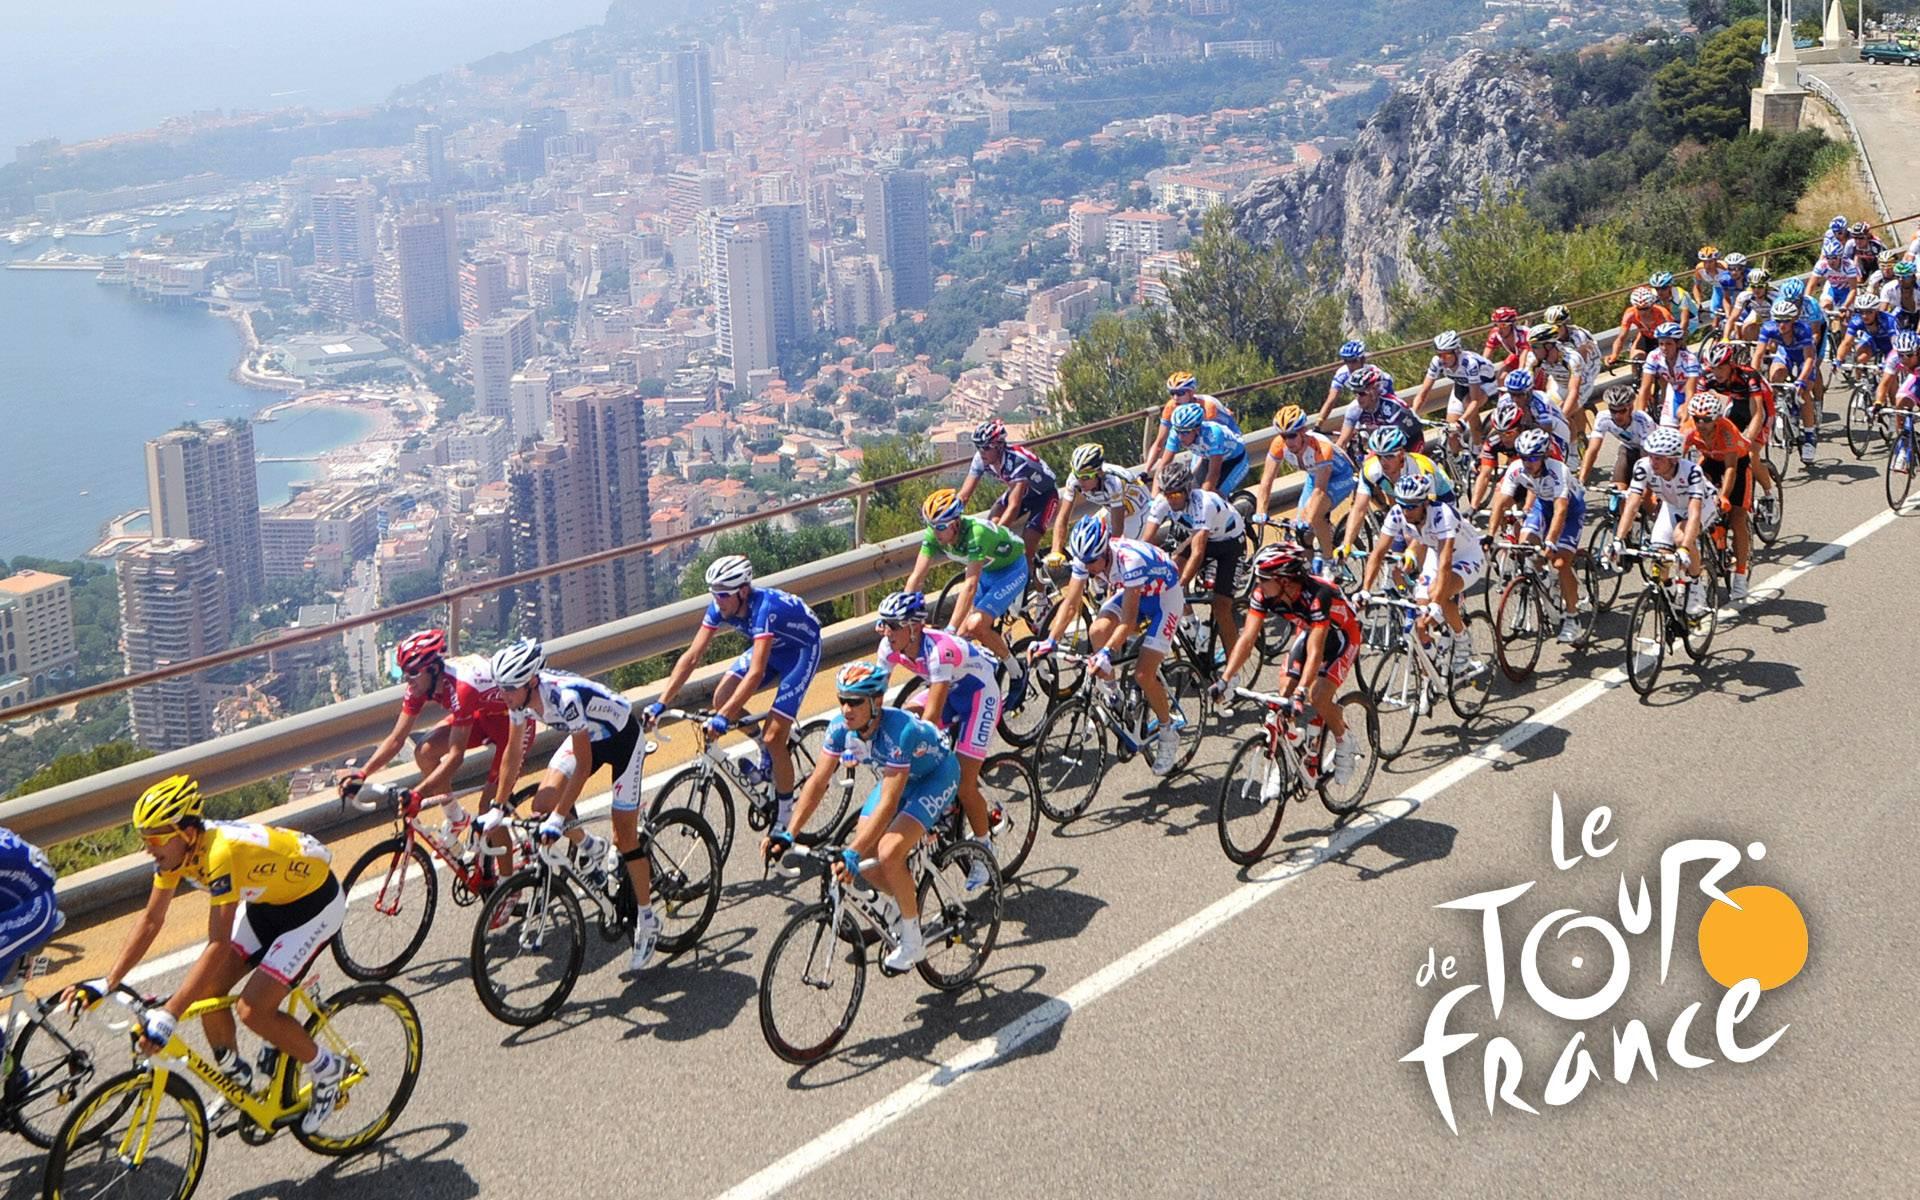 Tour de france wallpaper Bicycling photos Sport wallpapersPicture 1920x1200